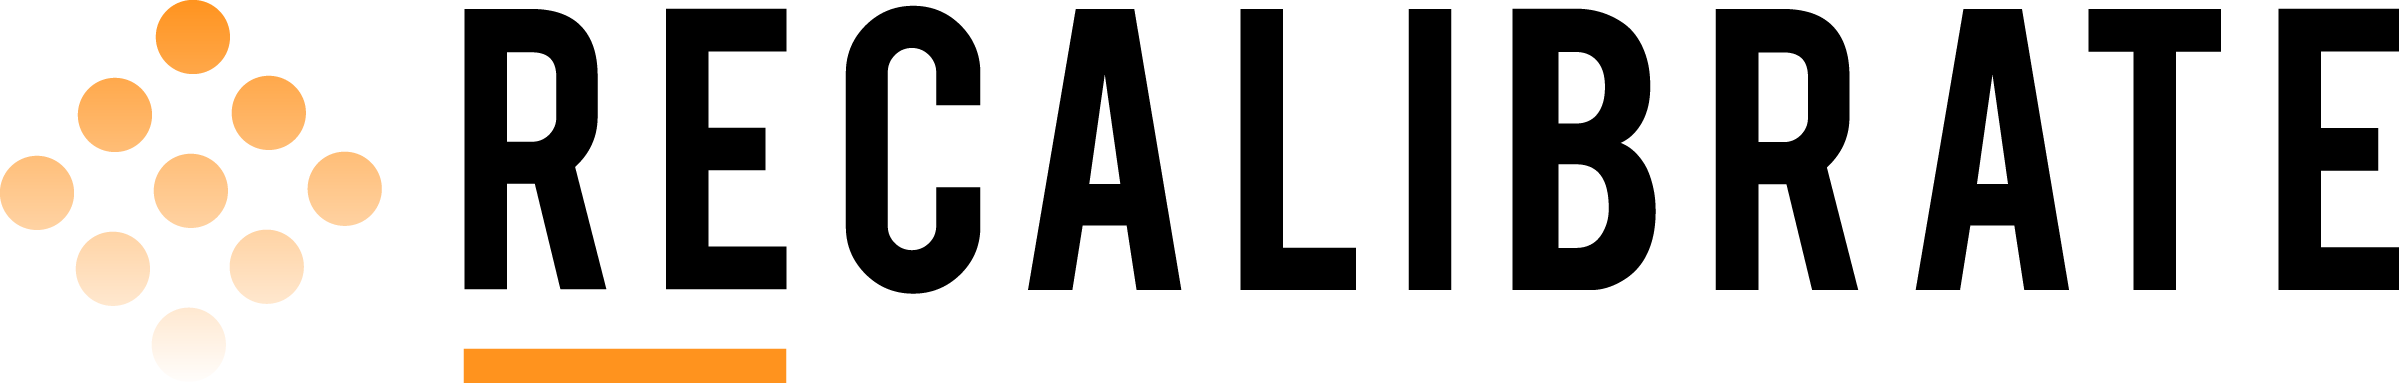 Relevant_Logo_Final.png